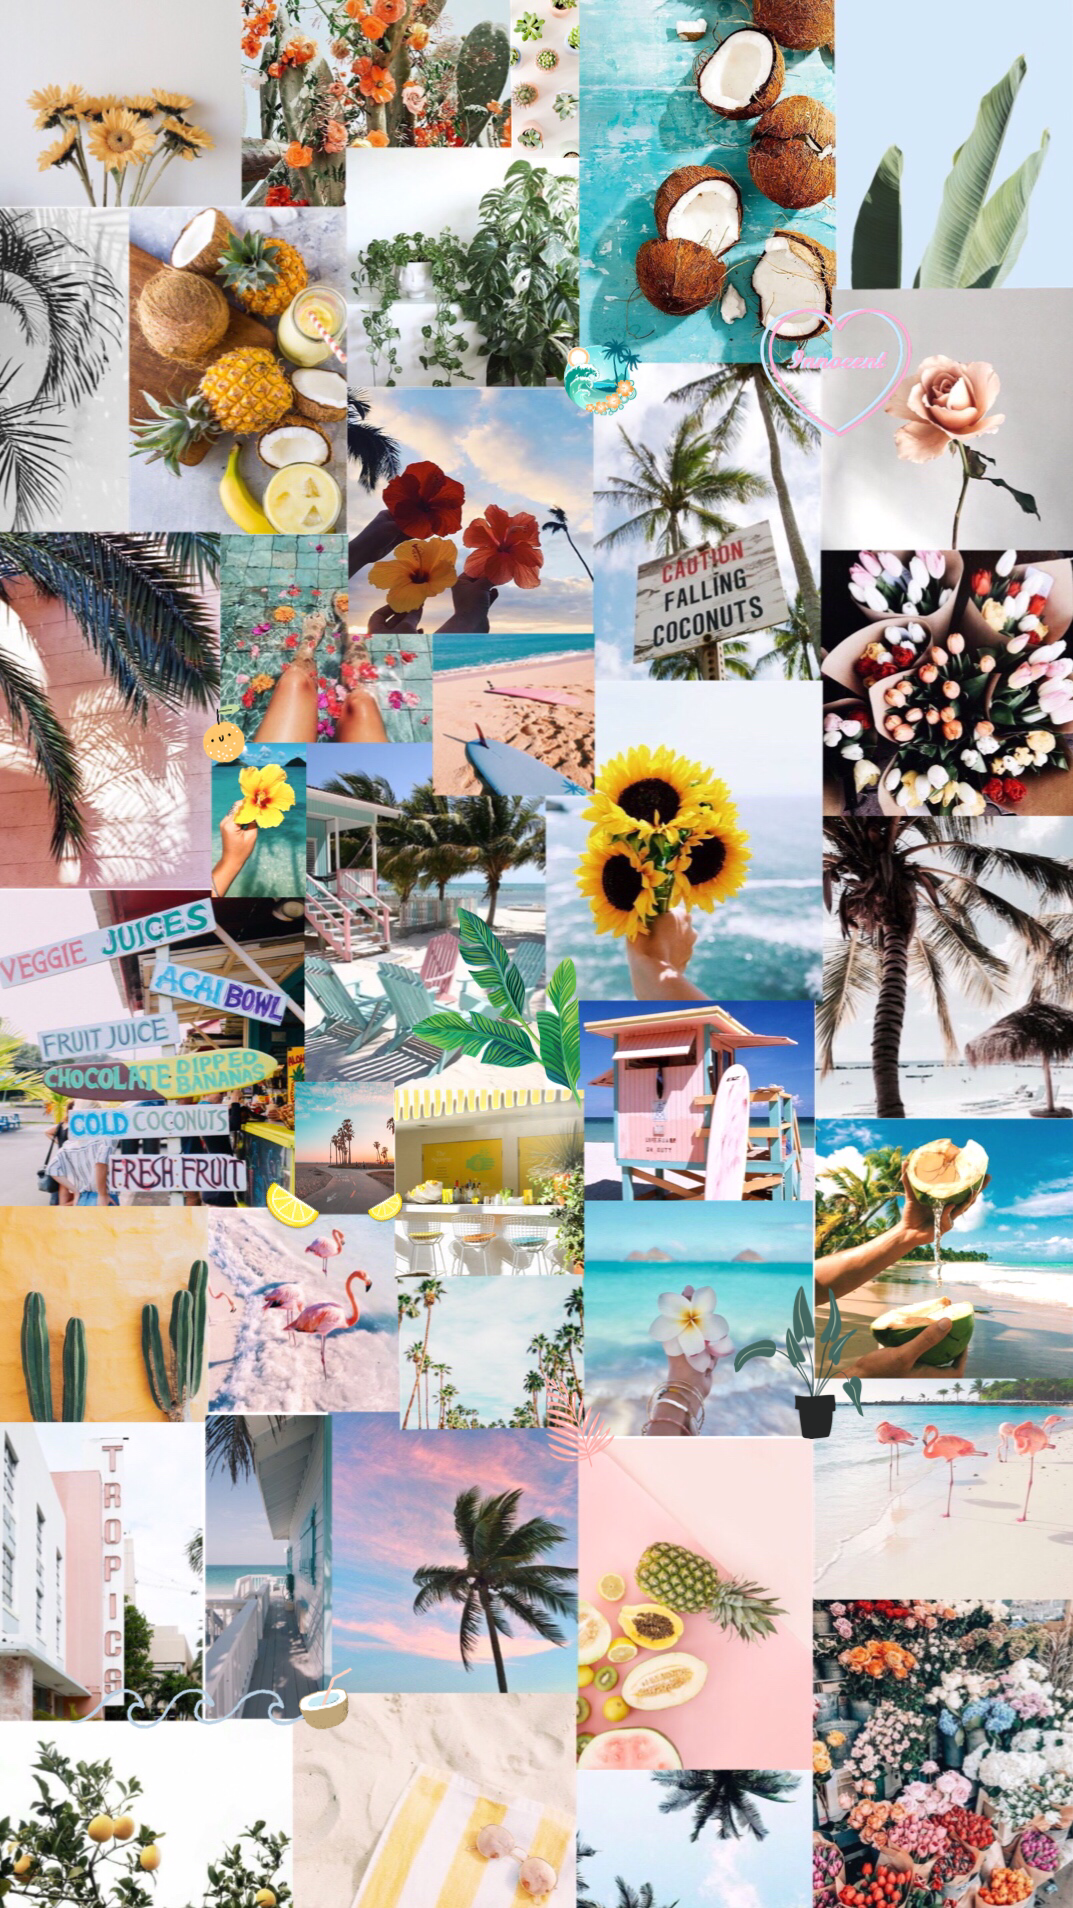 Tropical Aesthetic Background Wallpaper Tumblr Lockscreen Aesthetic Iphone Wallpaper Iphone Wallpaper Tumblr Aesthetic